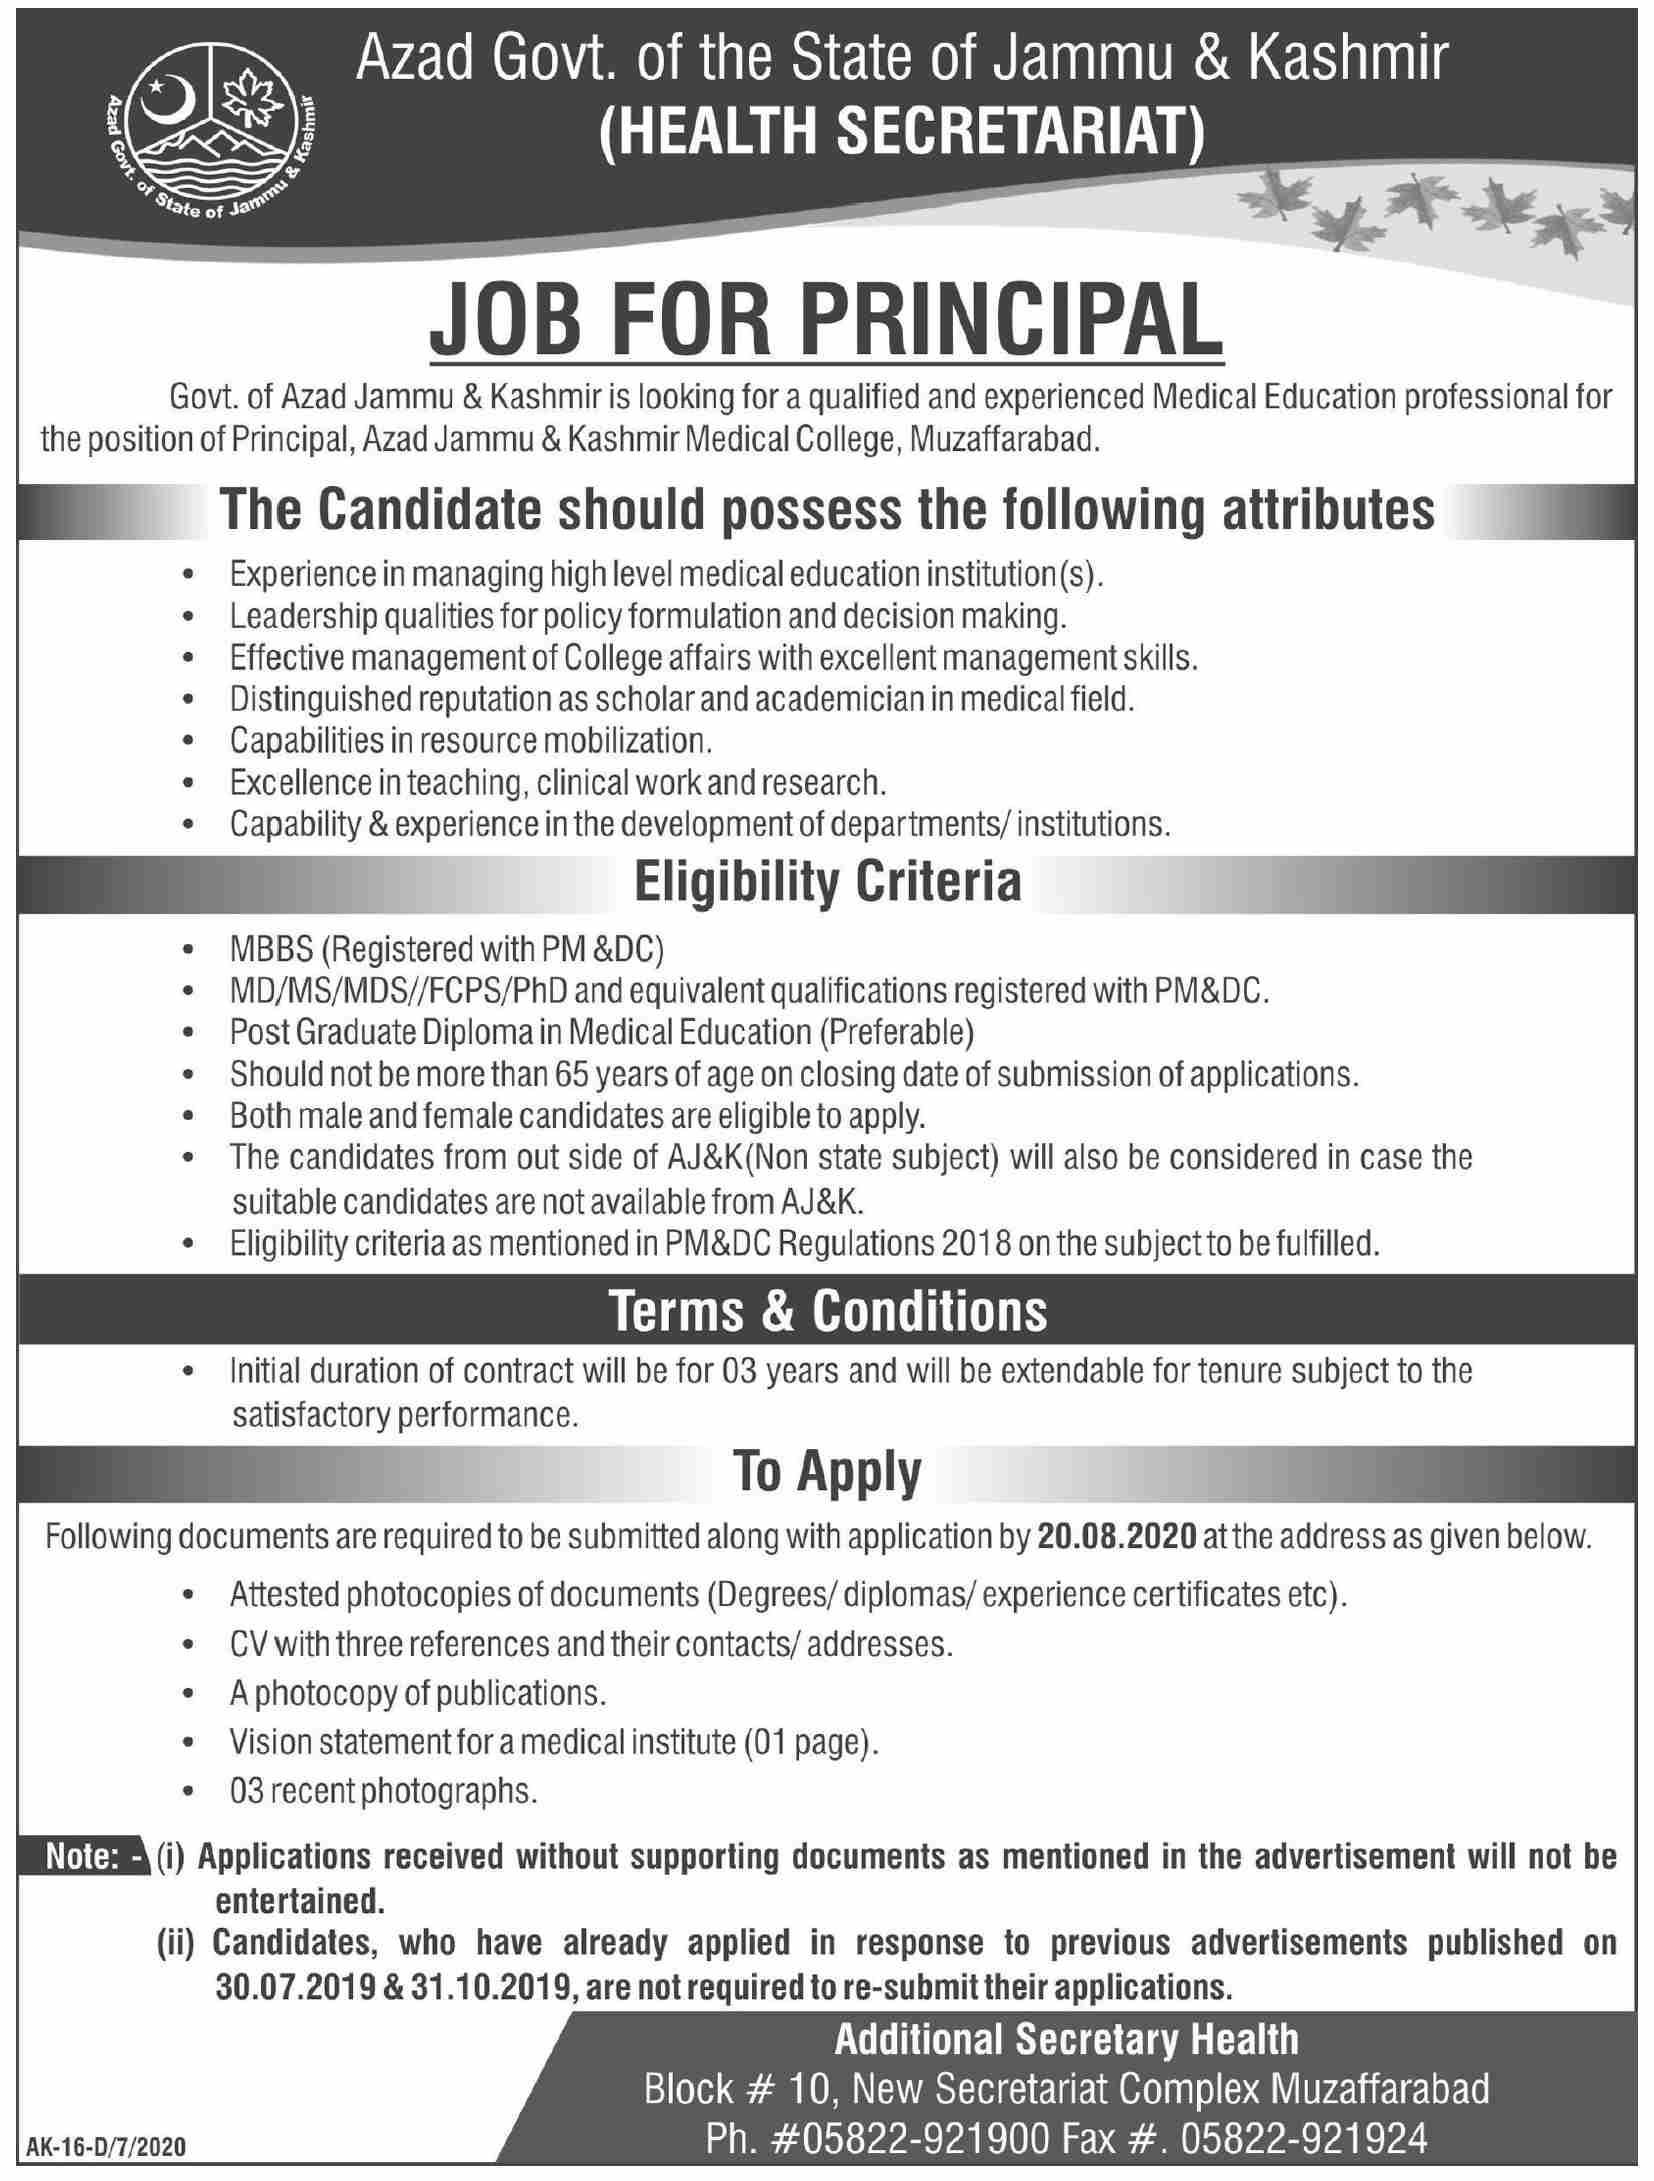 Health Department jobs newspaper ad for Principal in Muzaffarabad